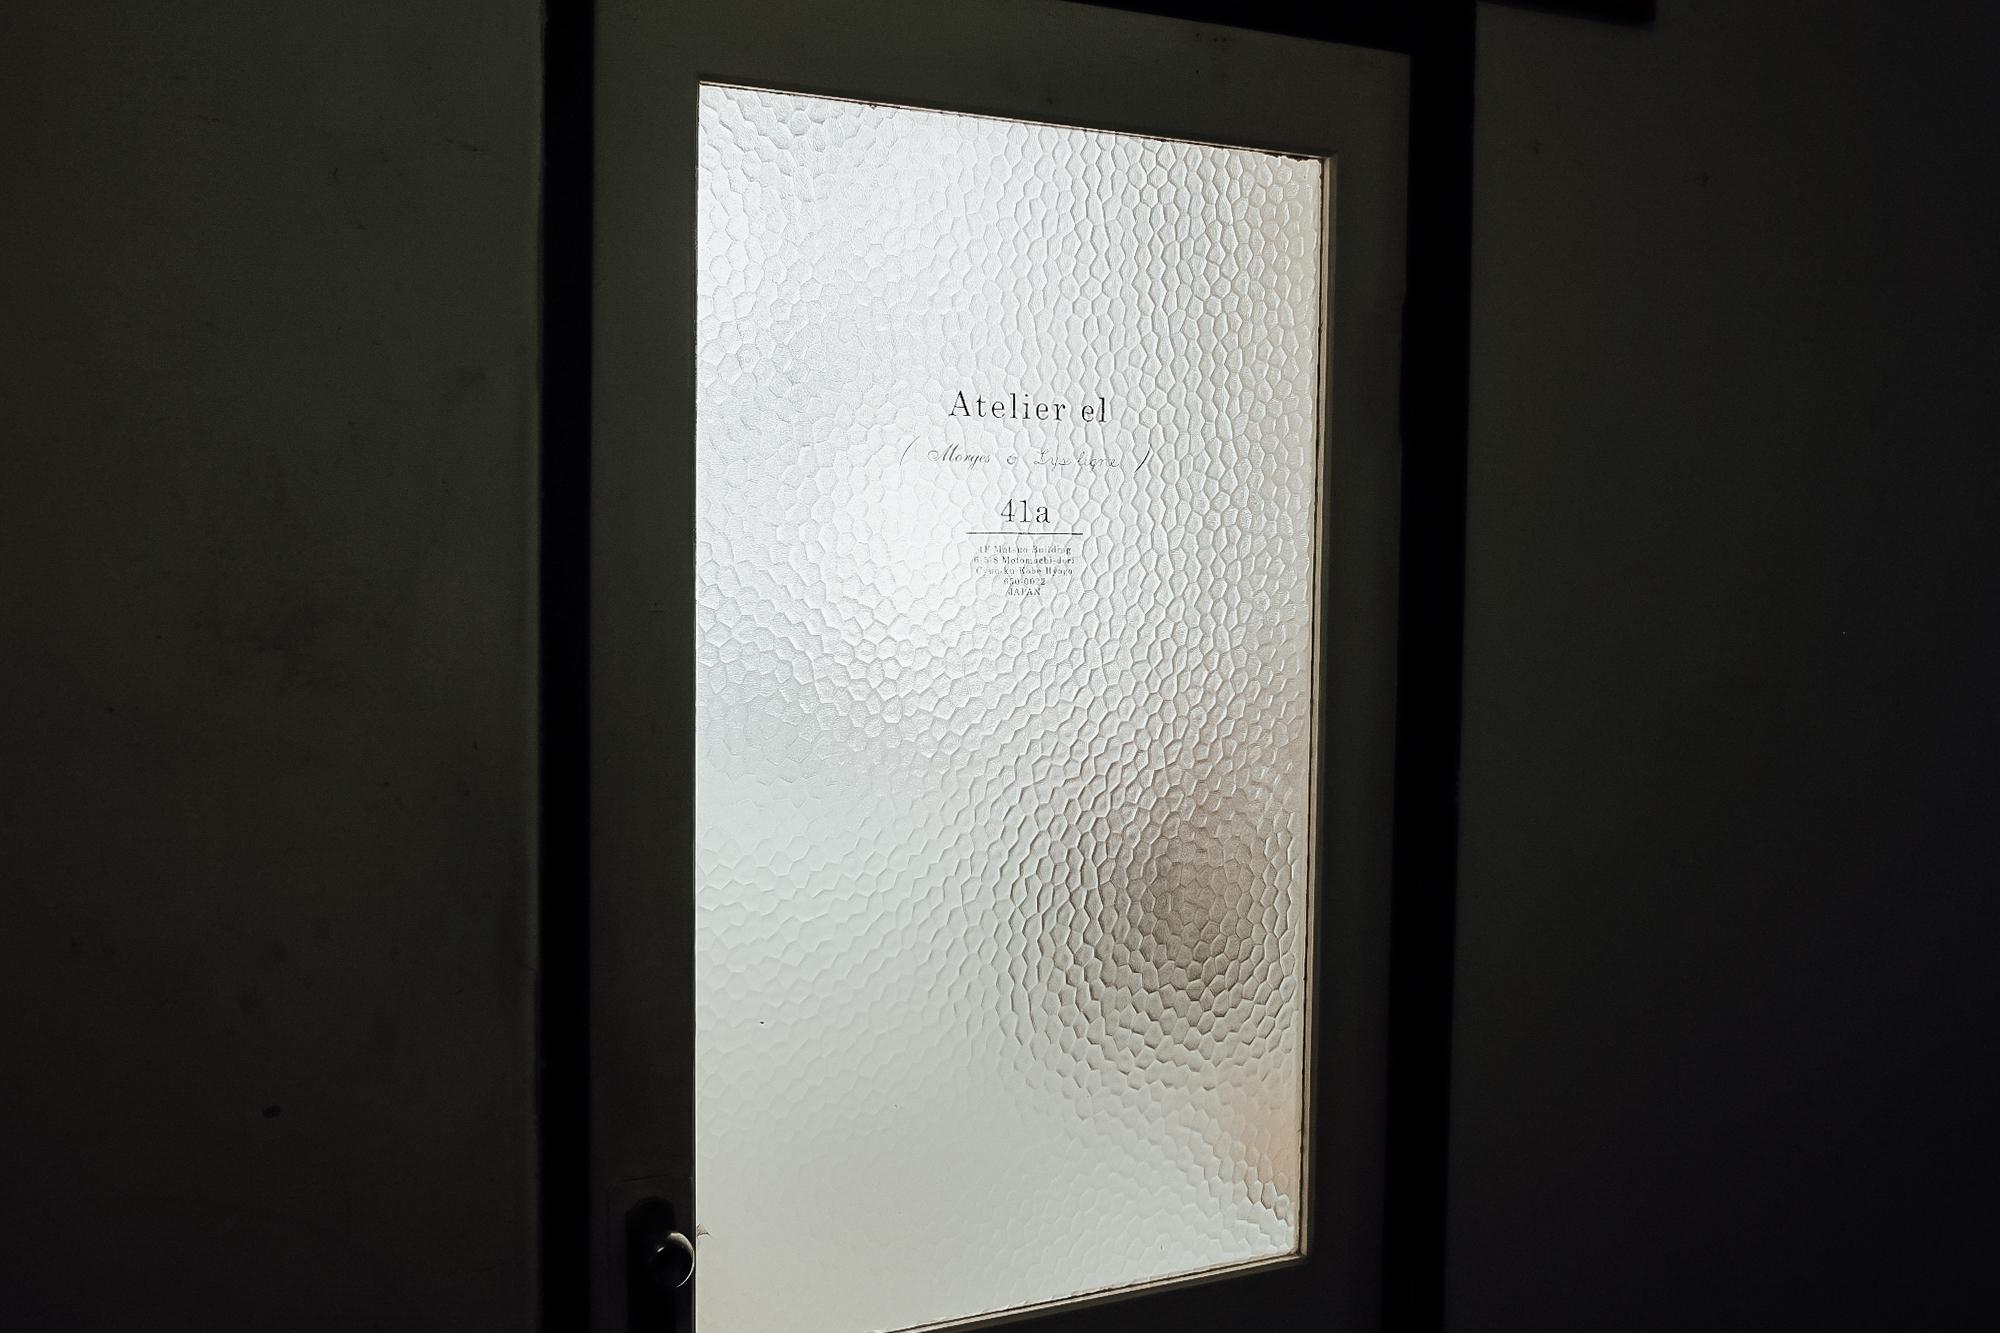 atelier elのアトリエ・入り口